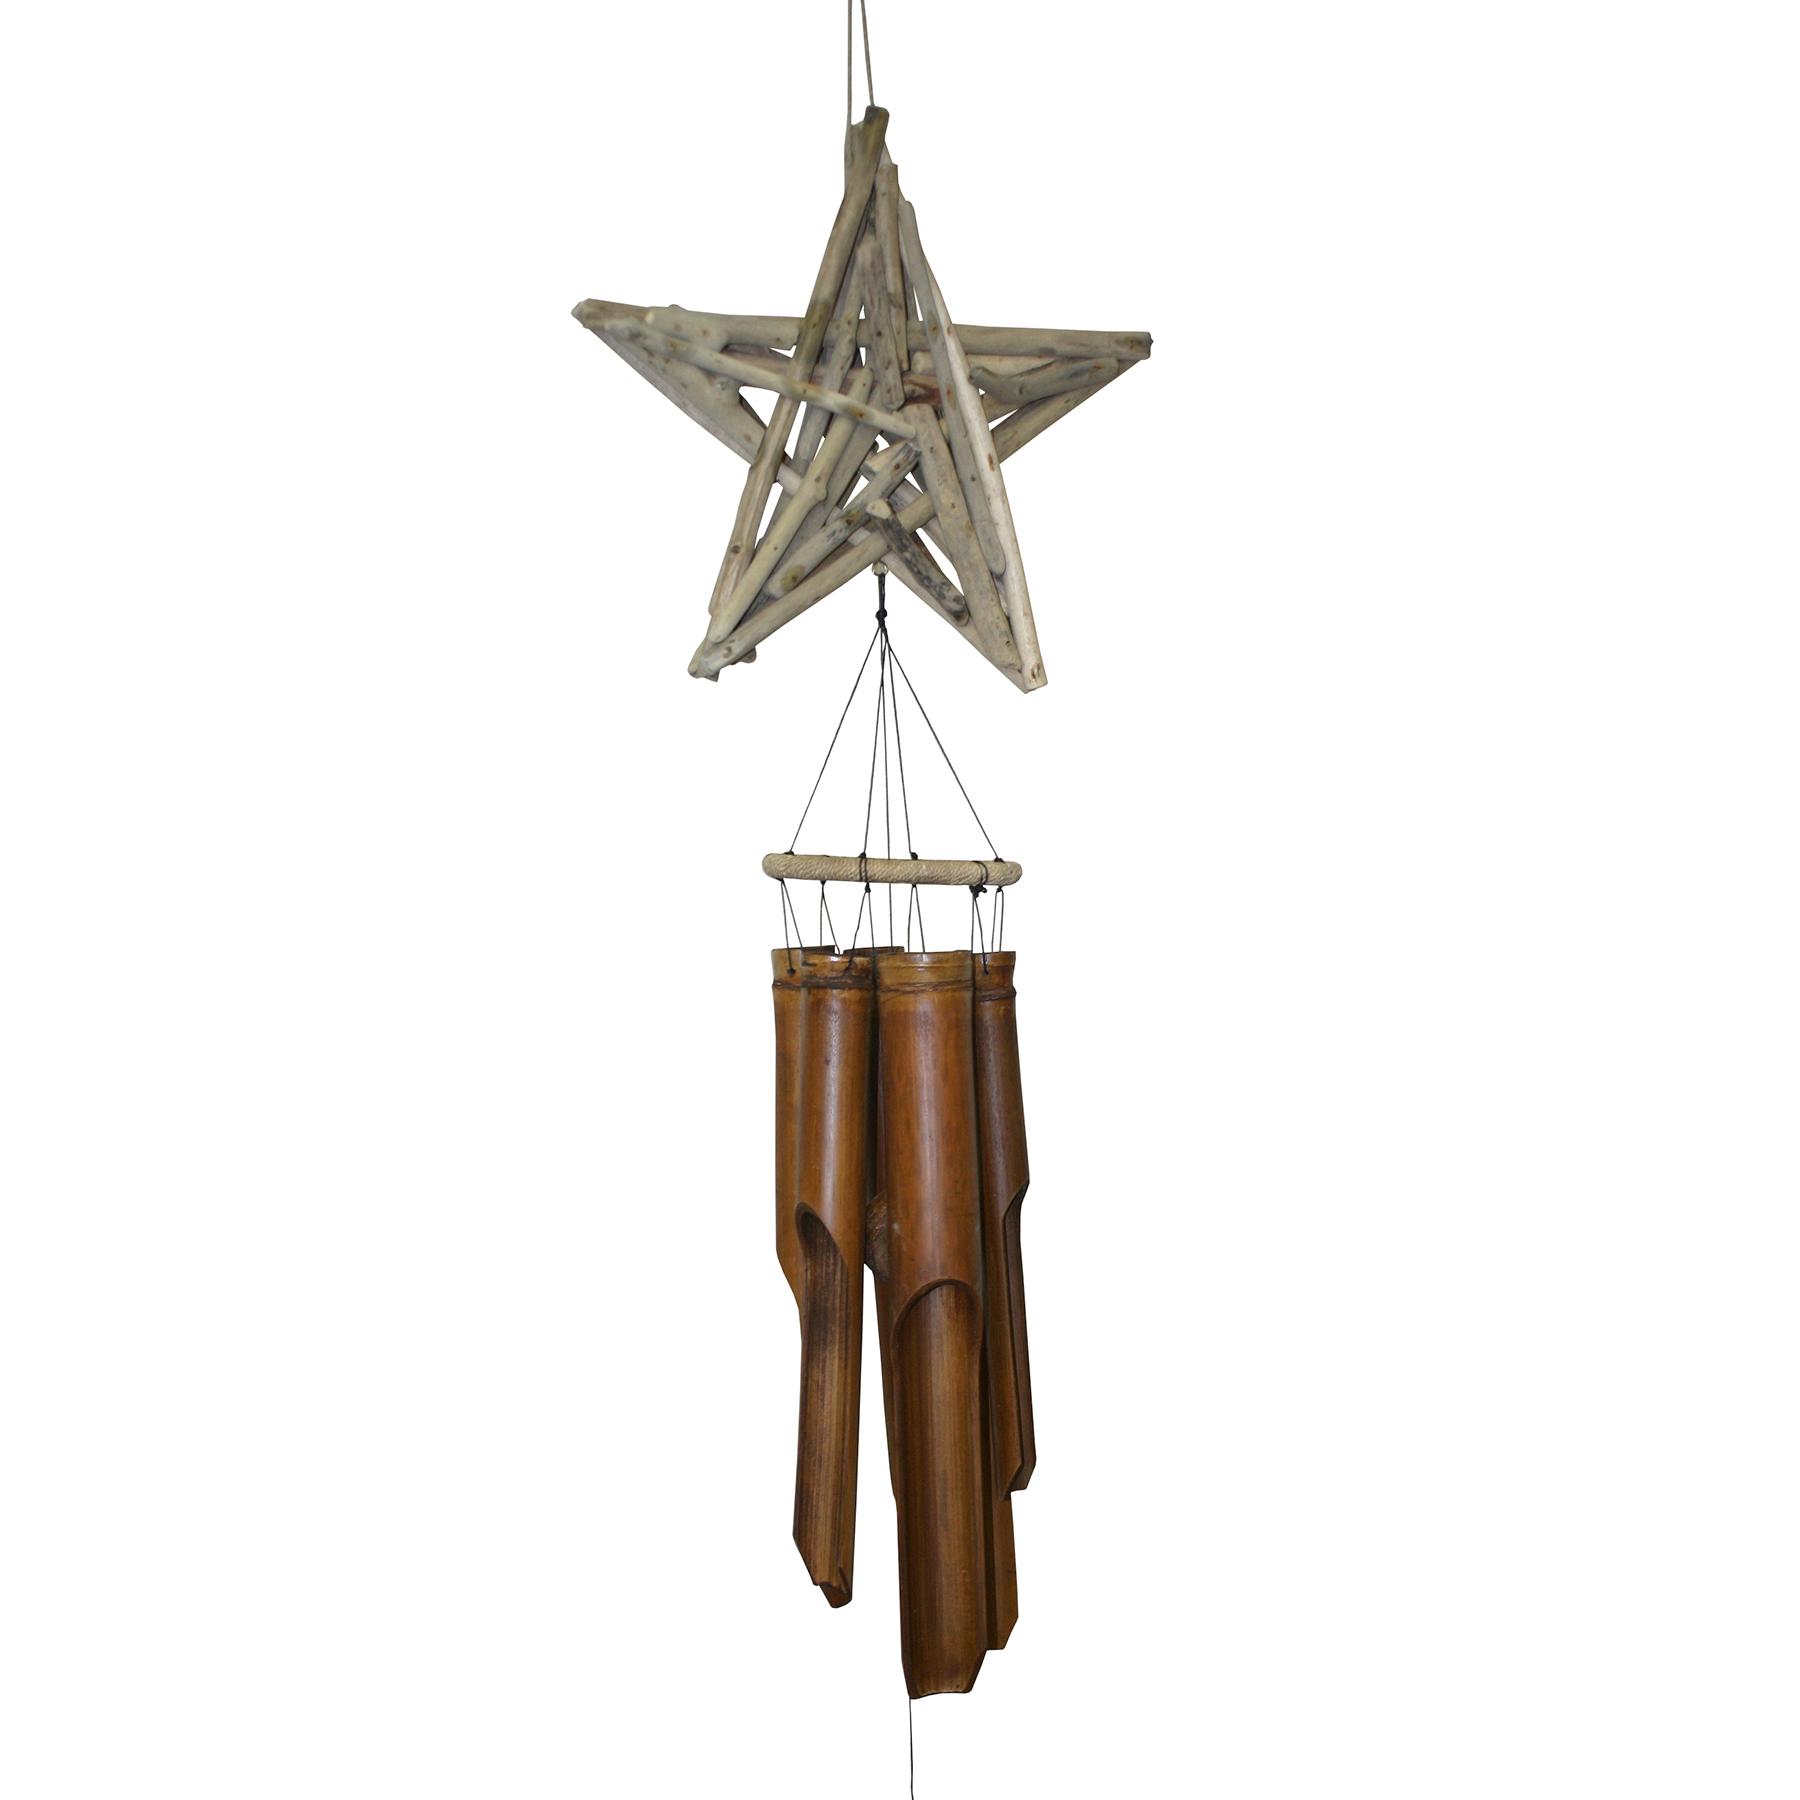 241 - Driftwood Star Bamboo Wind Chime